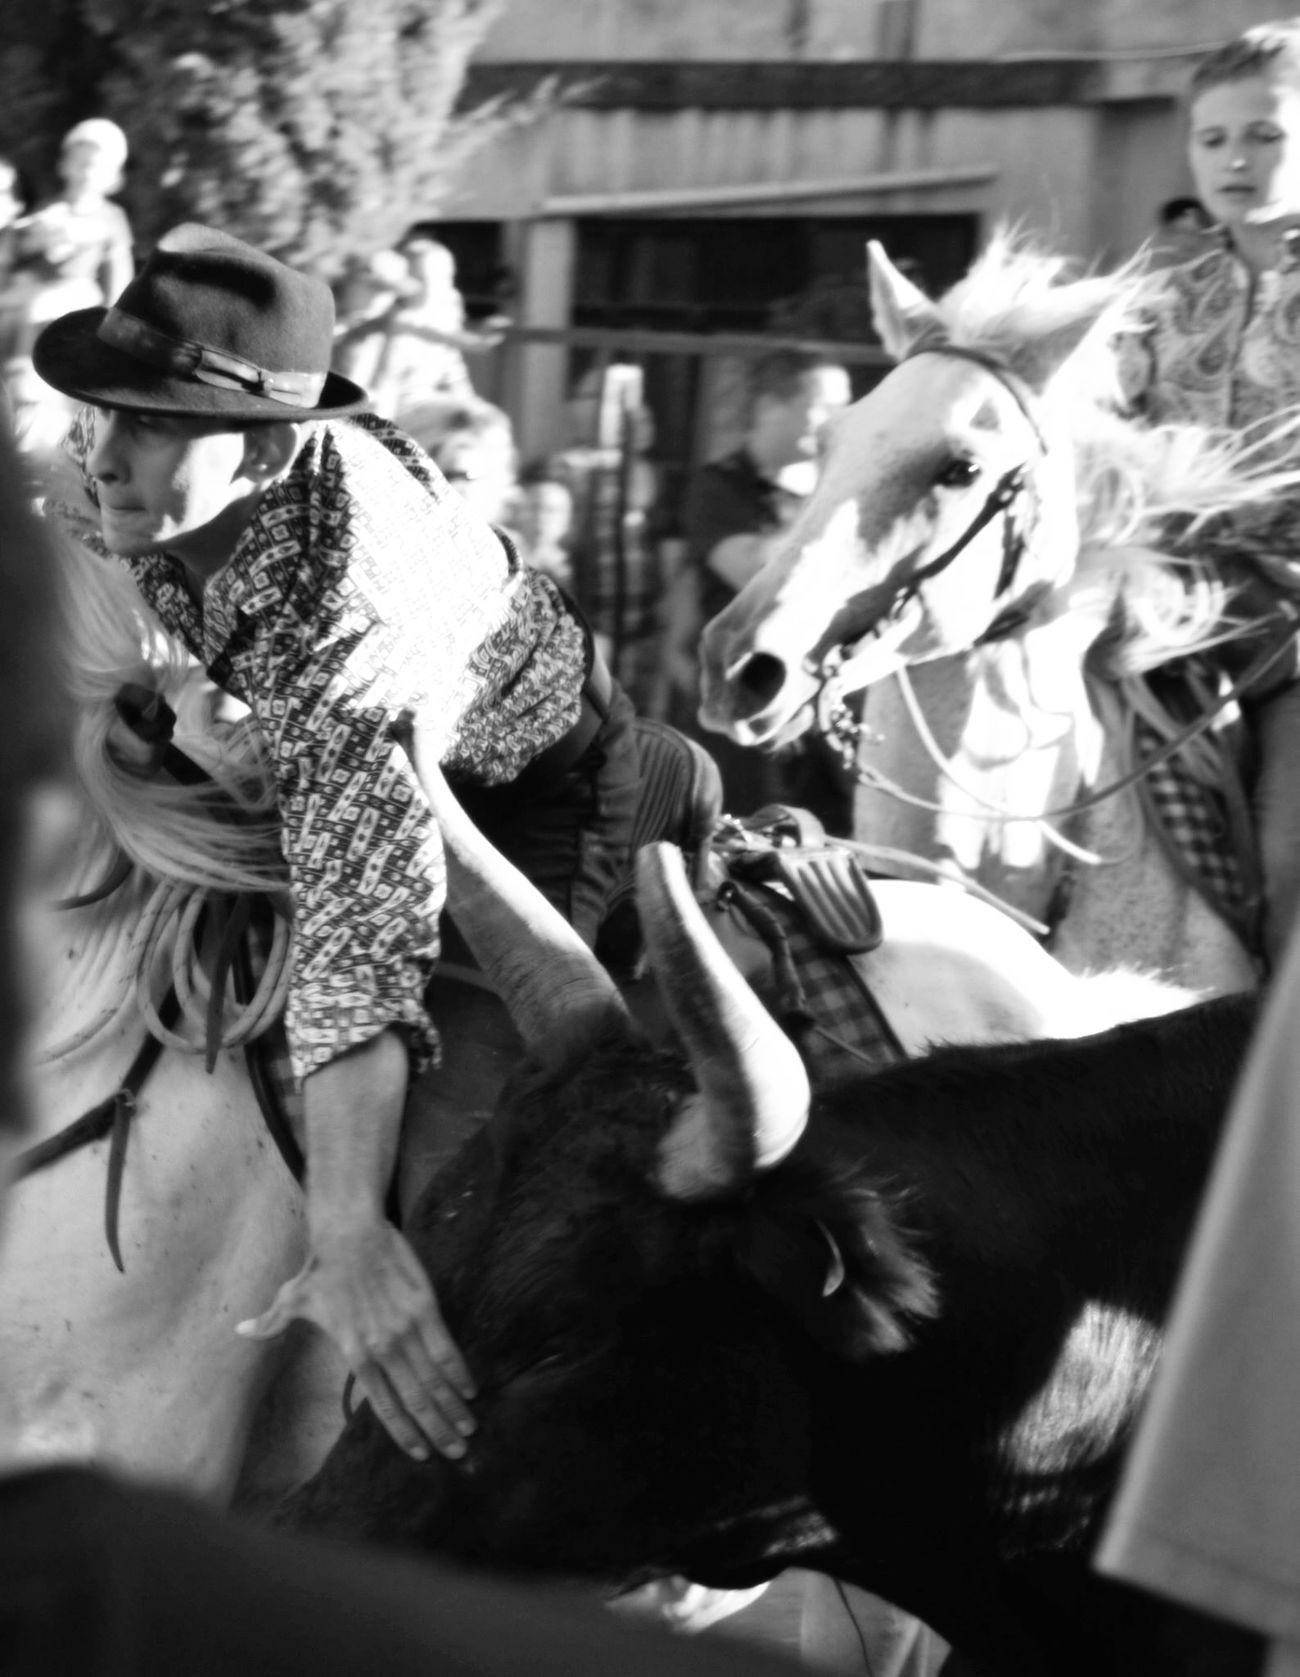 Shades Of Grey Streetphotography Monochrome Blackandwhite Gardian Toros Horses Camargue Bandido